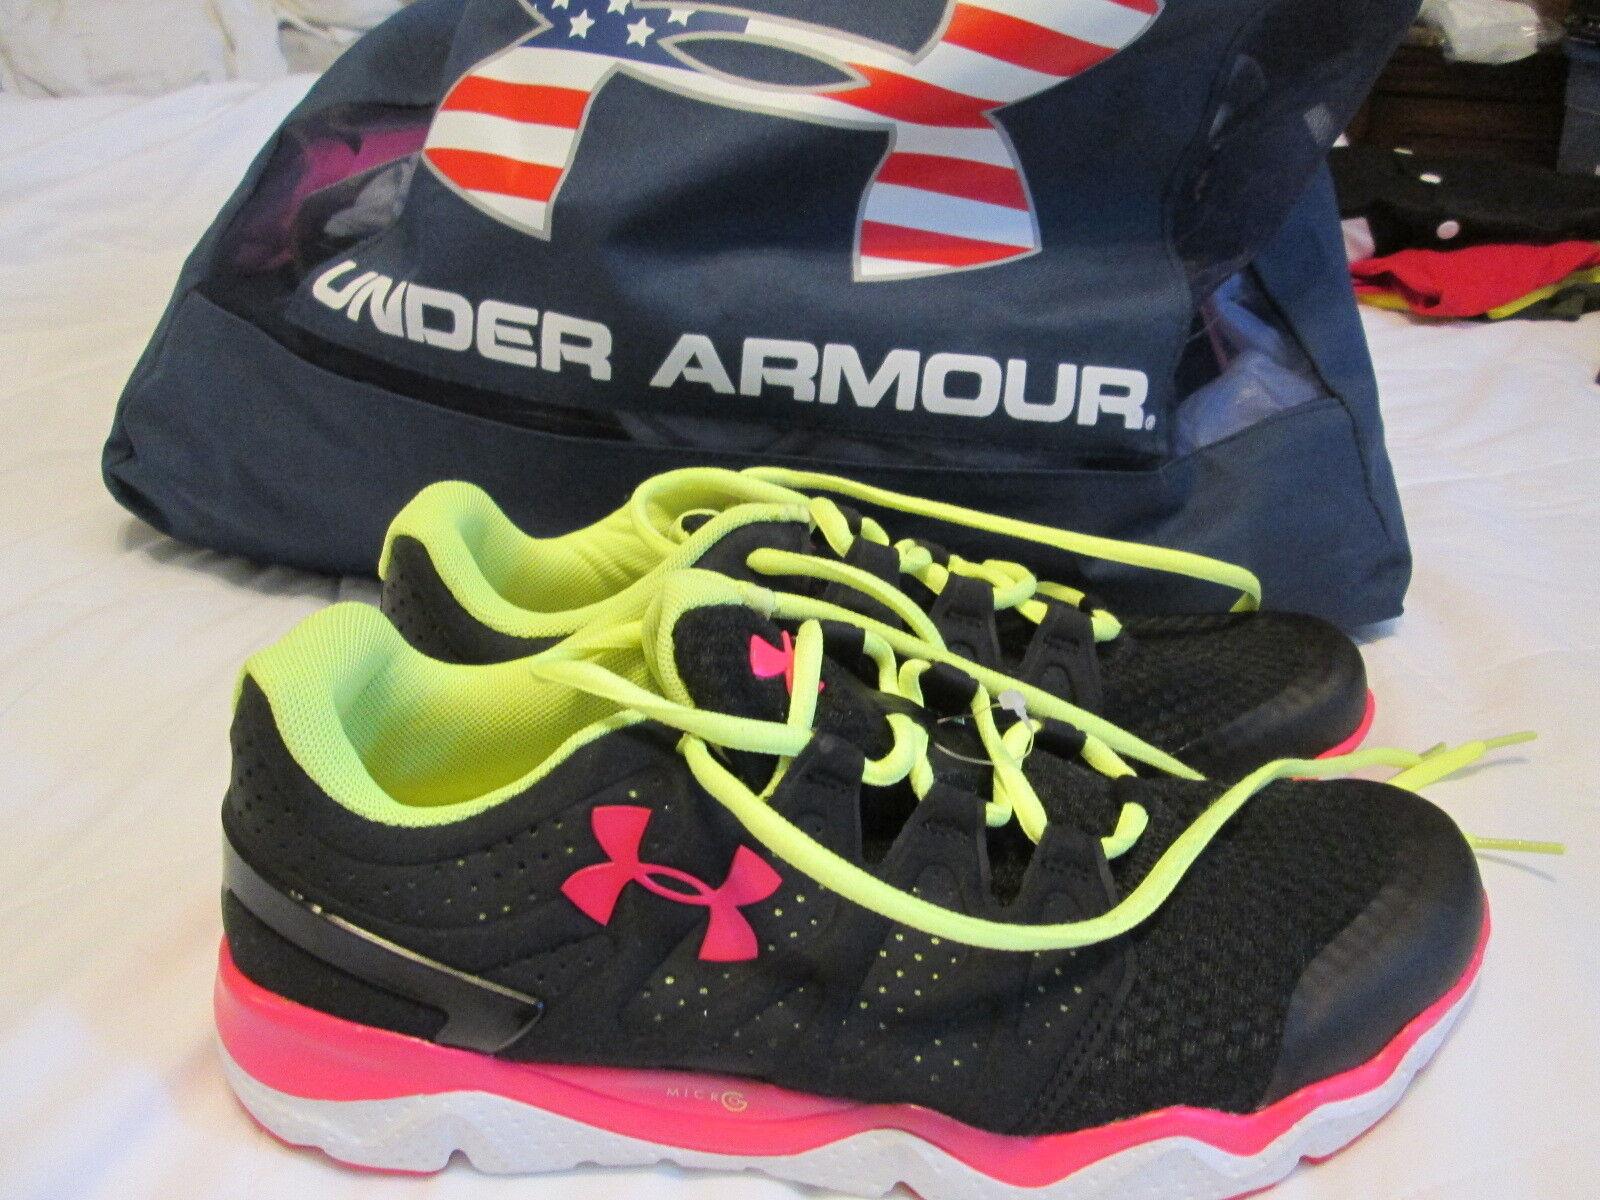 Puma Athletic 9.5, Shoes - Men's Size 9.5, Athletic Black/White 145b11